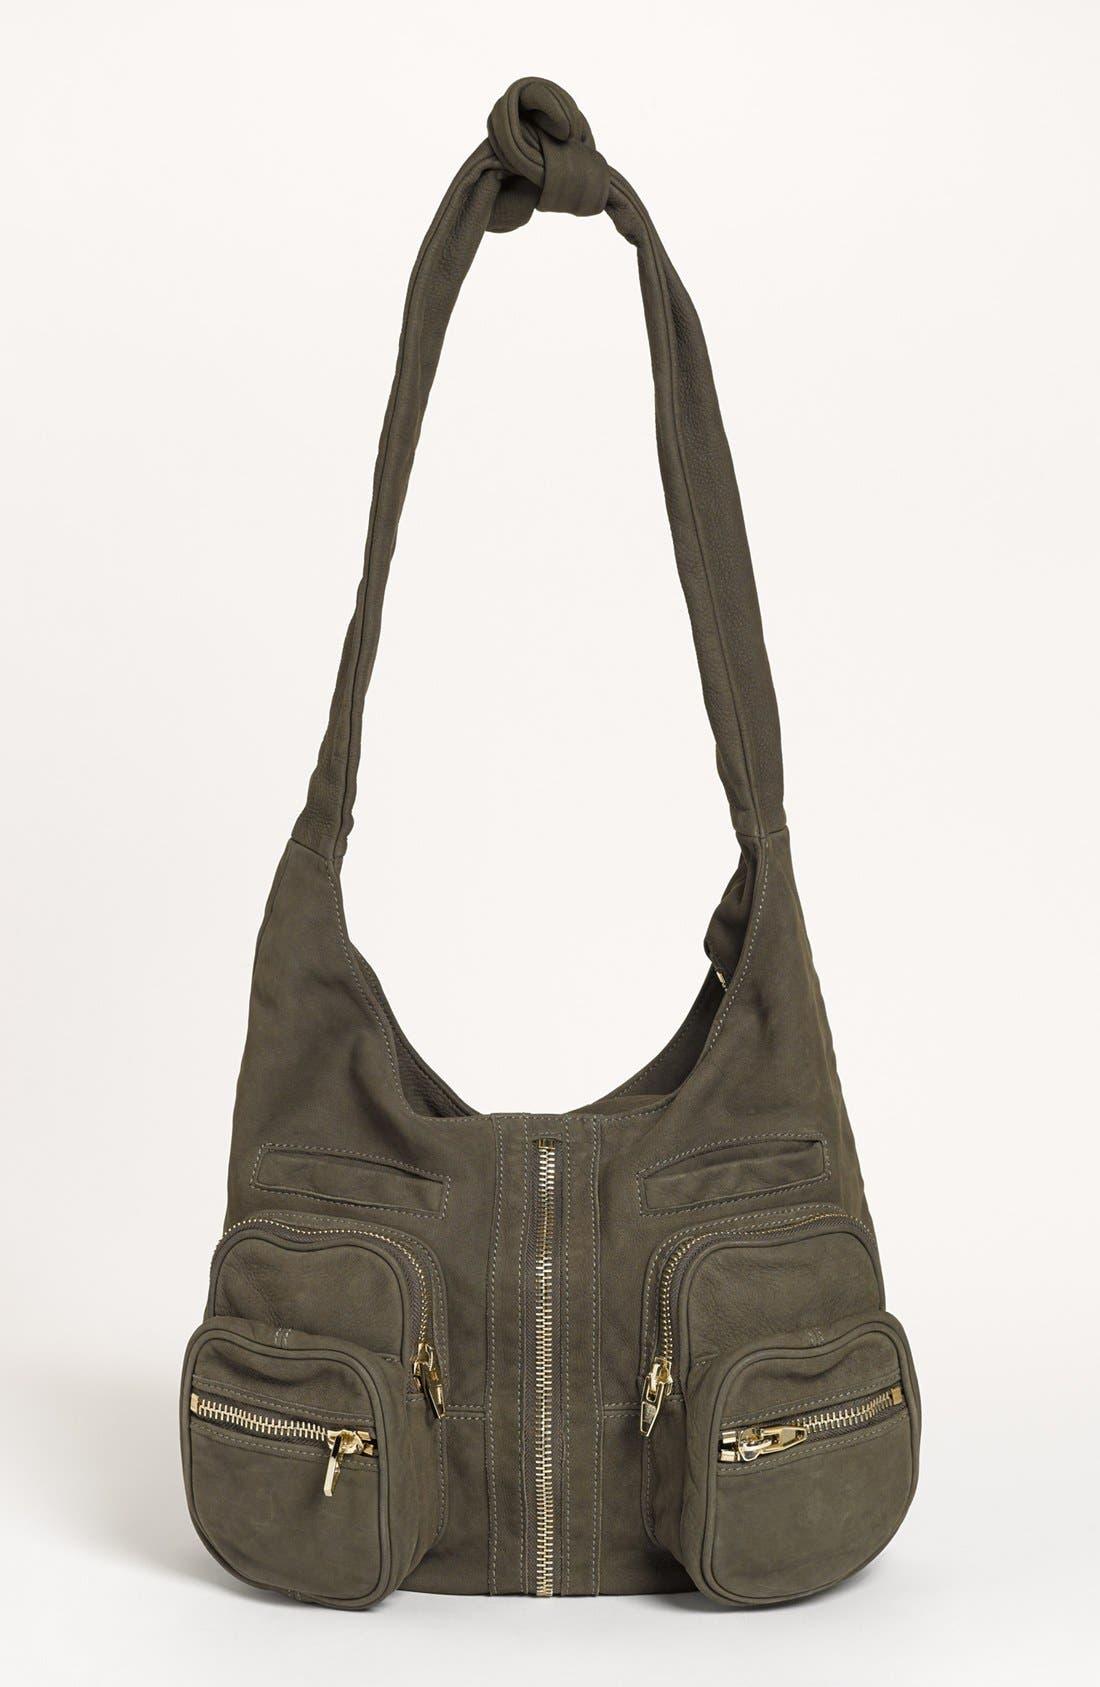 Main Image - Alexander Wang 'Donna - Pale Gold' Nubuck Leather Hobo